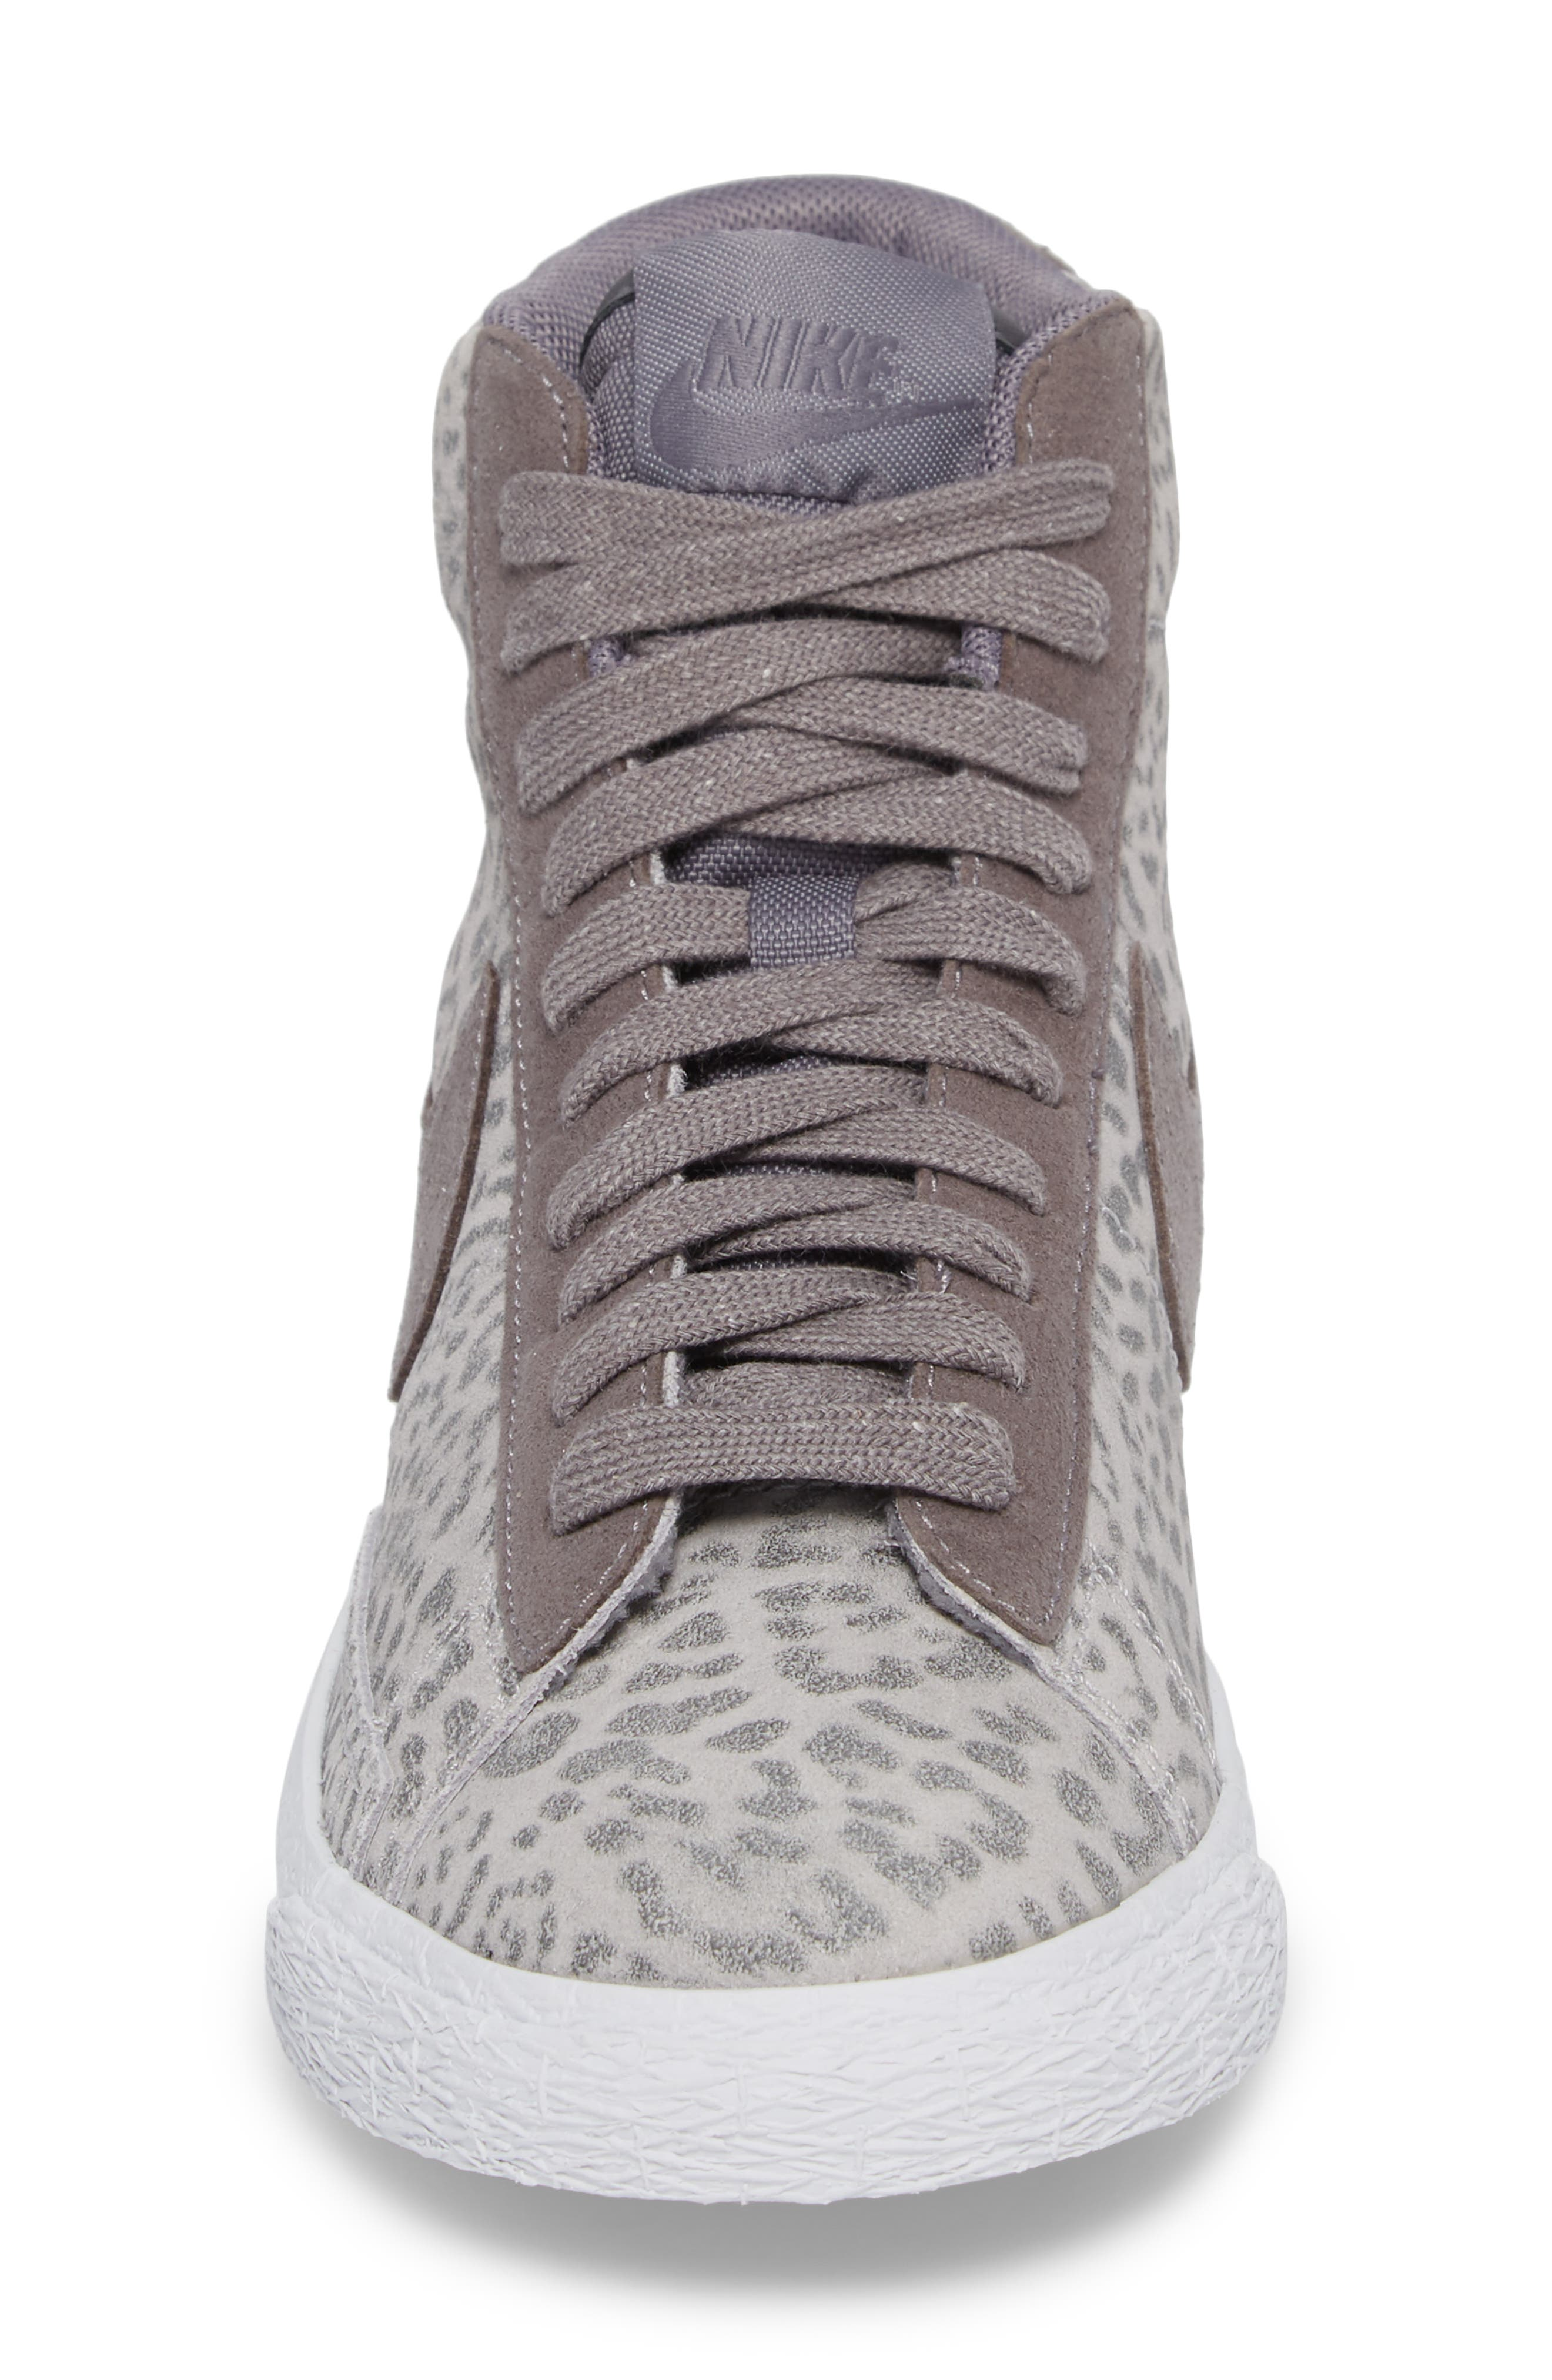 Blazer Mid SE High Top Sneaker,                             Alternate thumbnail 5, color,                             Atmosphere Grey/ Smoke/ Gum